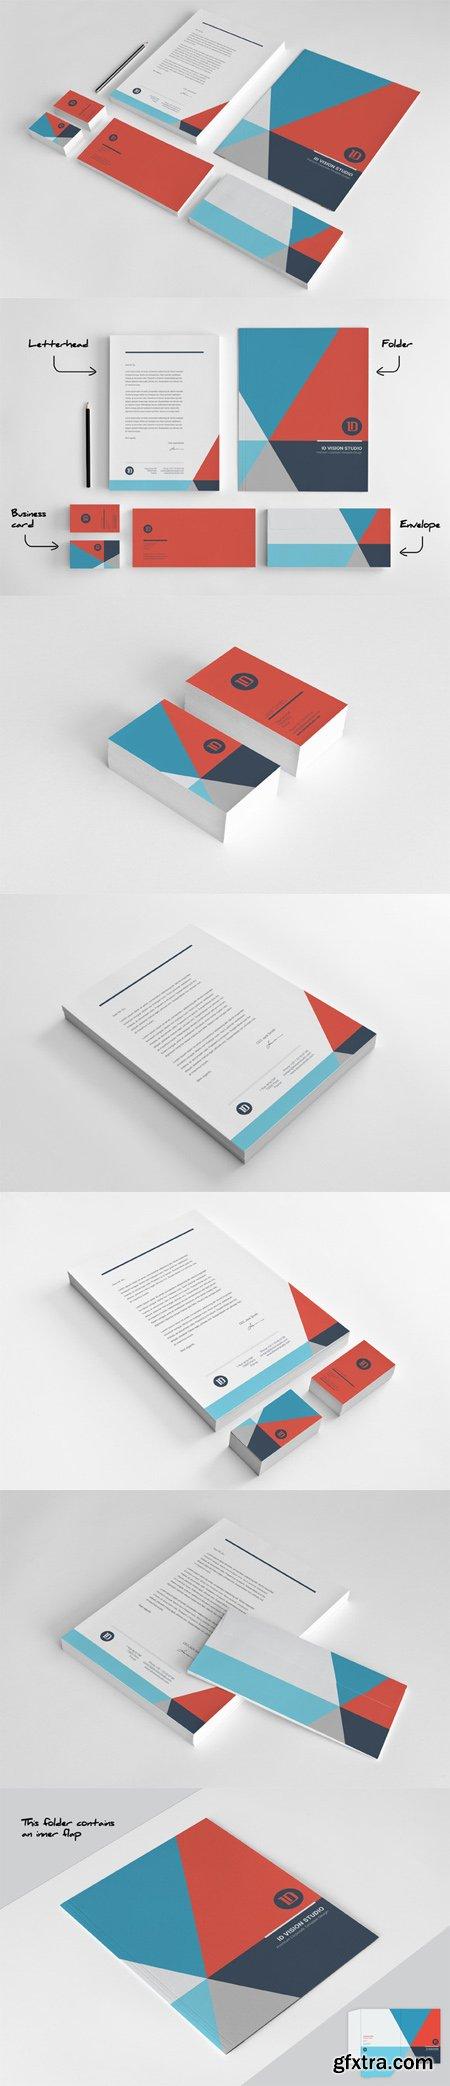 CreativeMarket - Stationery Corporate Identity 003 446454